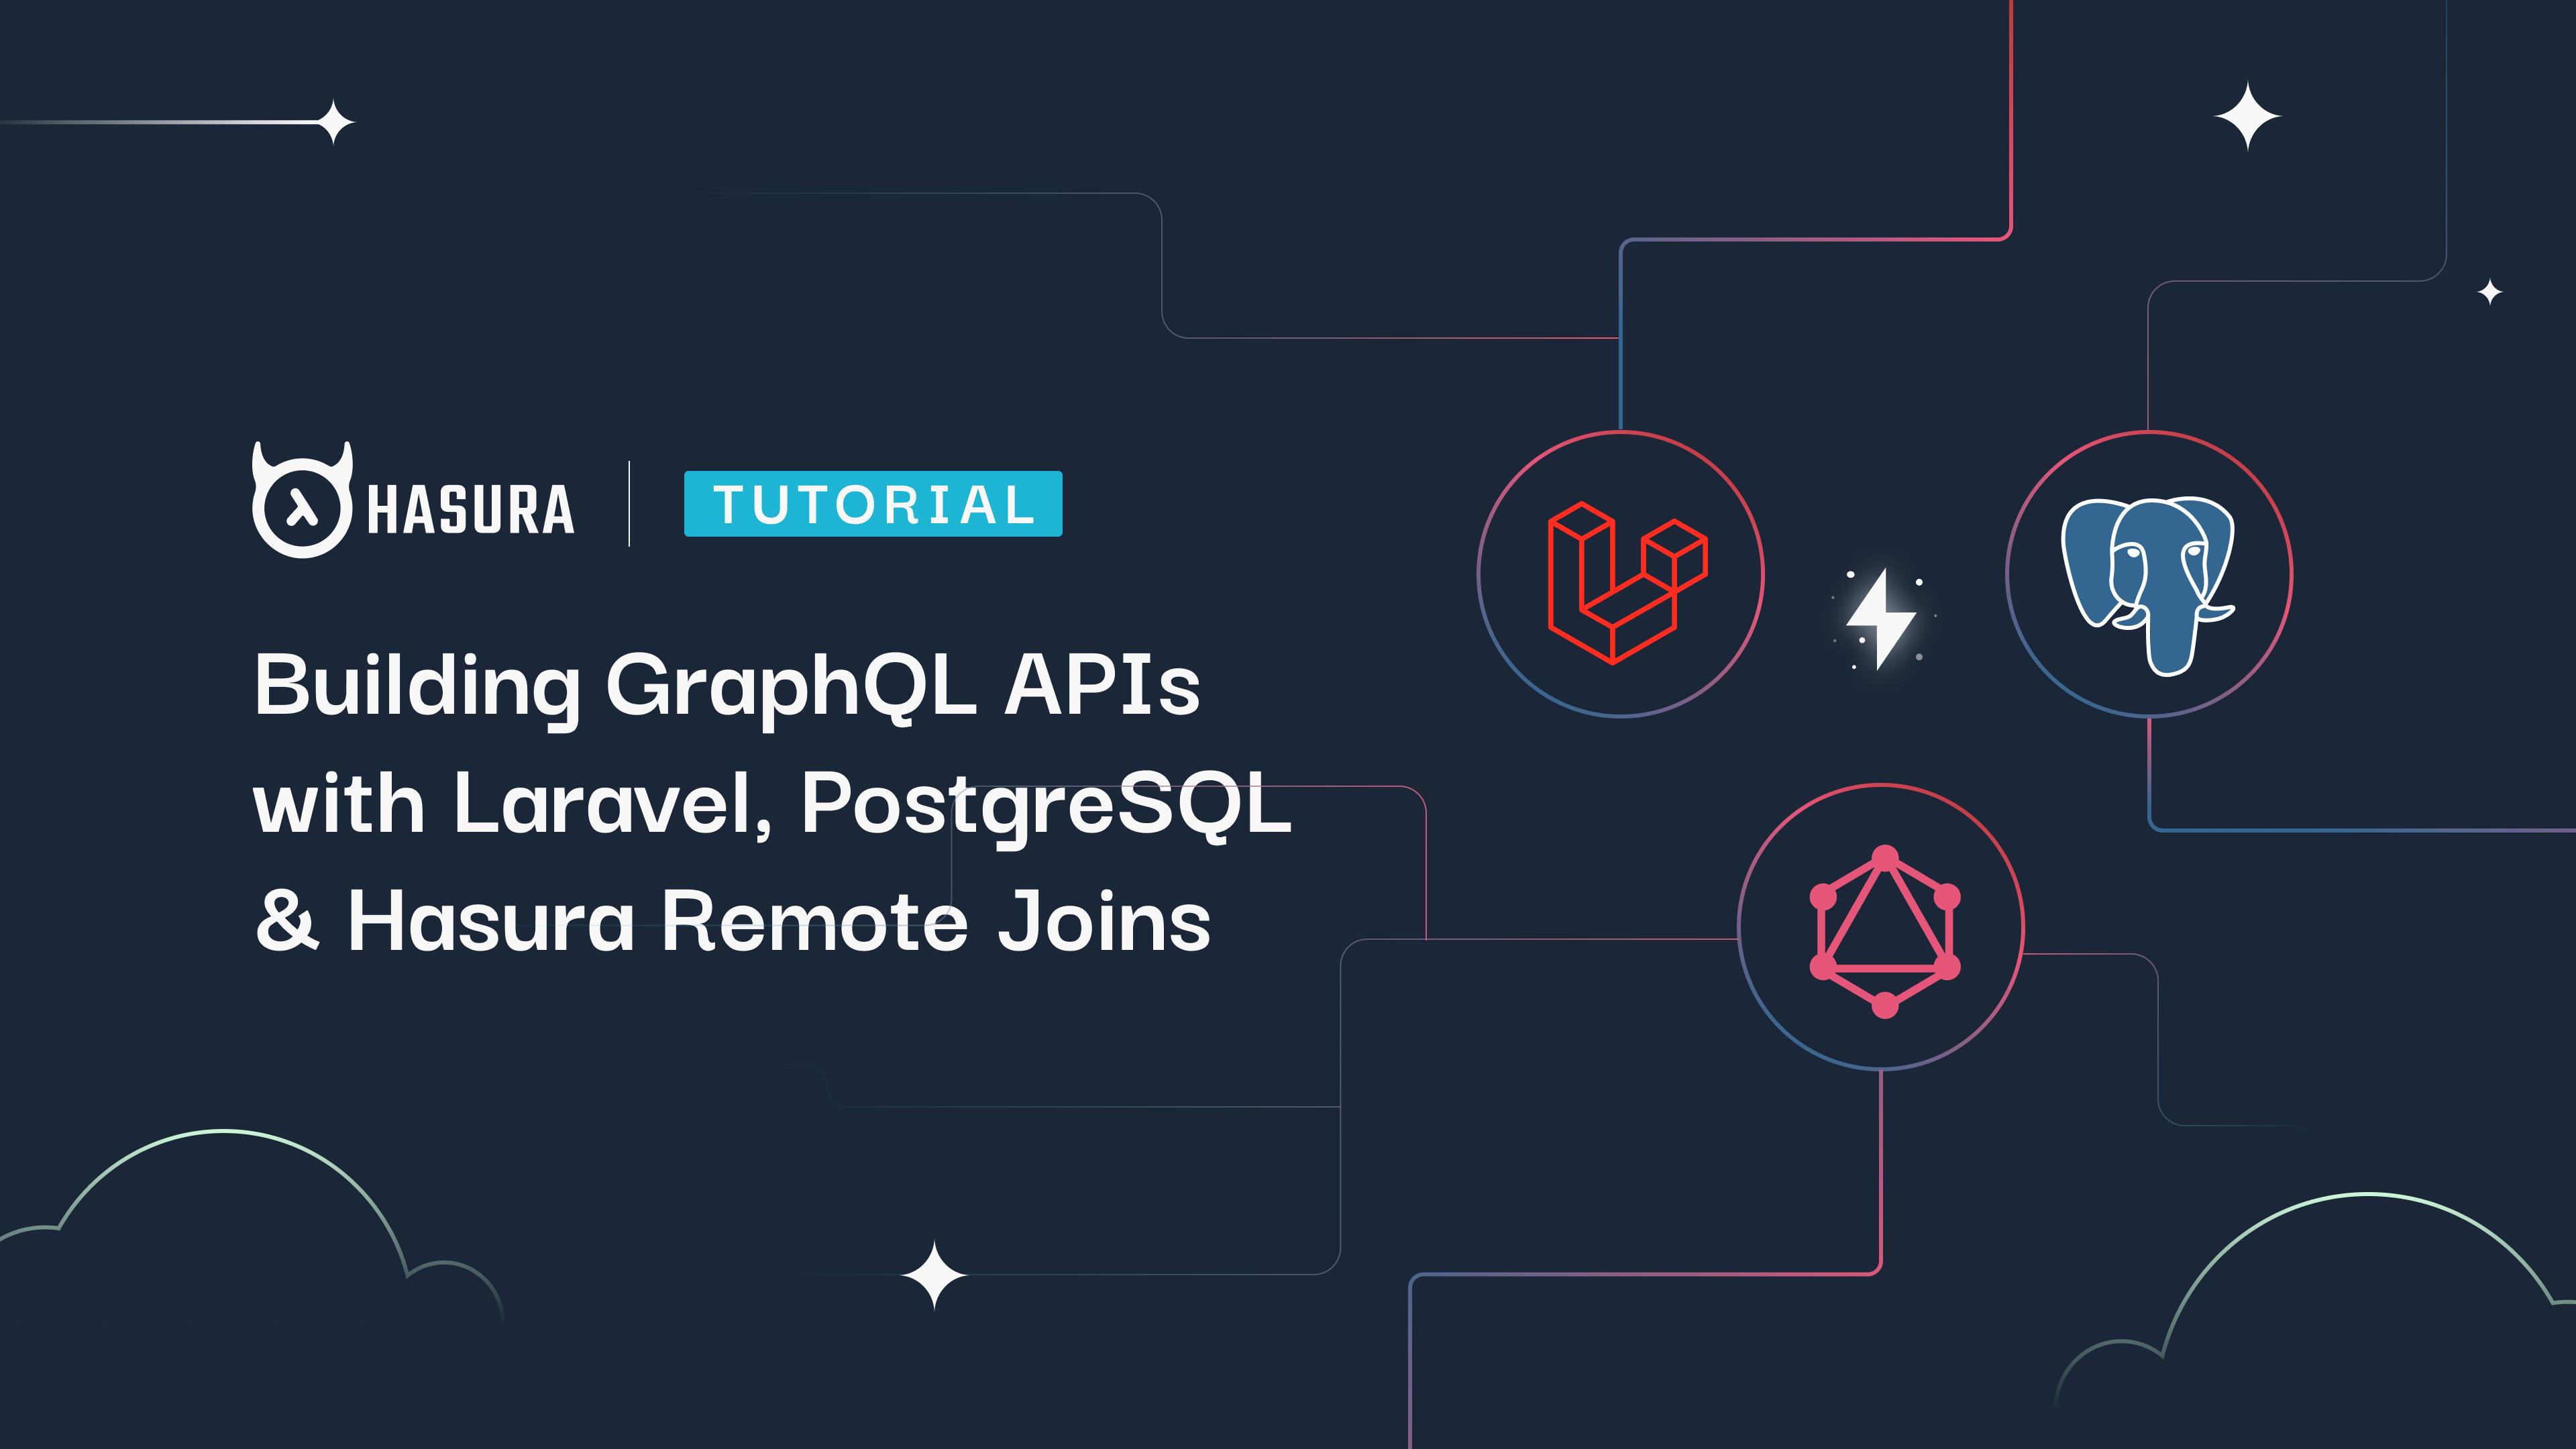 Building GraphQL APIs with Laravel, PostgreSQL and Hasura Remote Joins